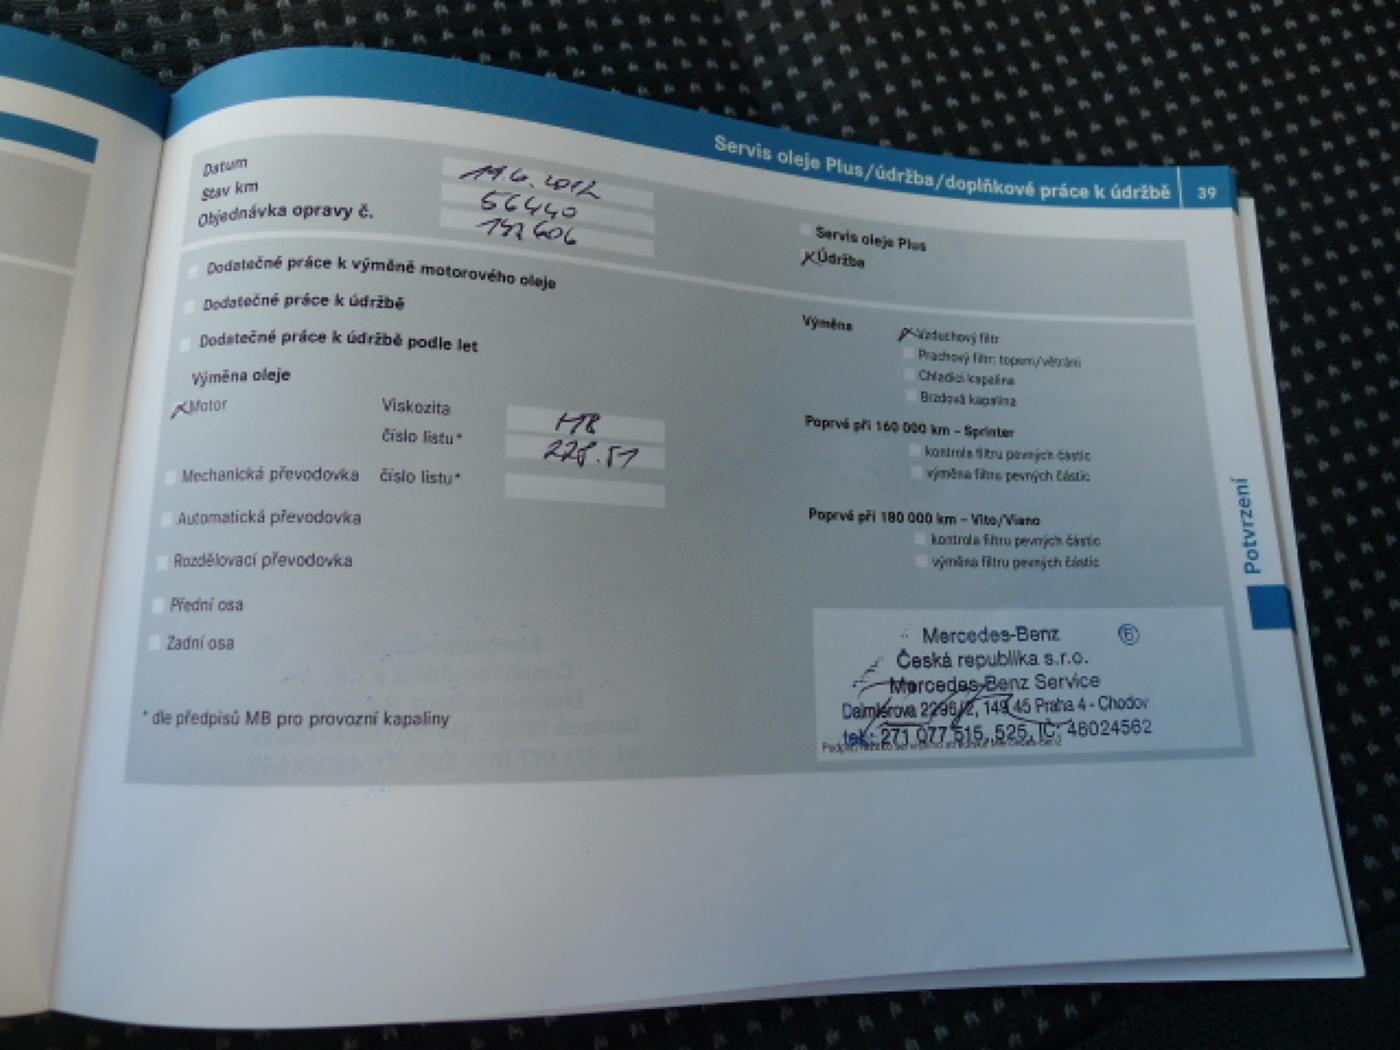 Mercedes-Benz Sprinter 319 CDI Maxi XXL + Klima Akce!!!! - 18